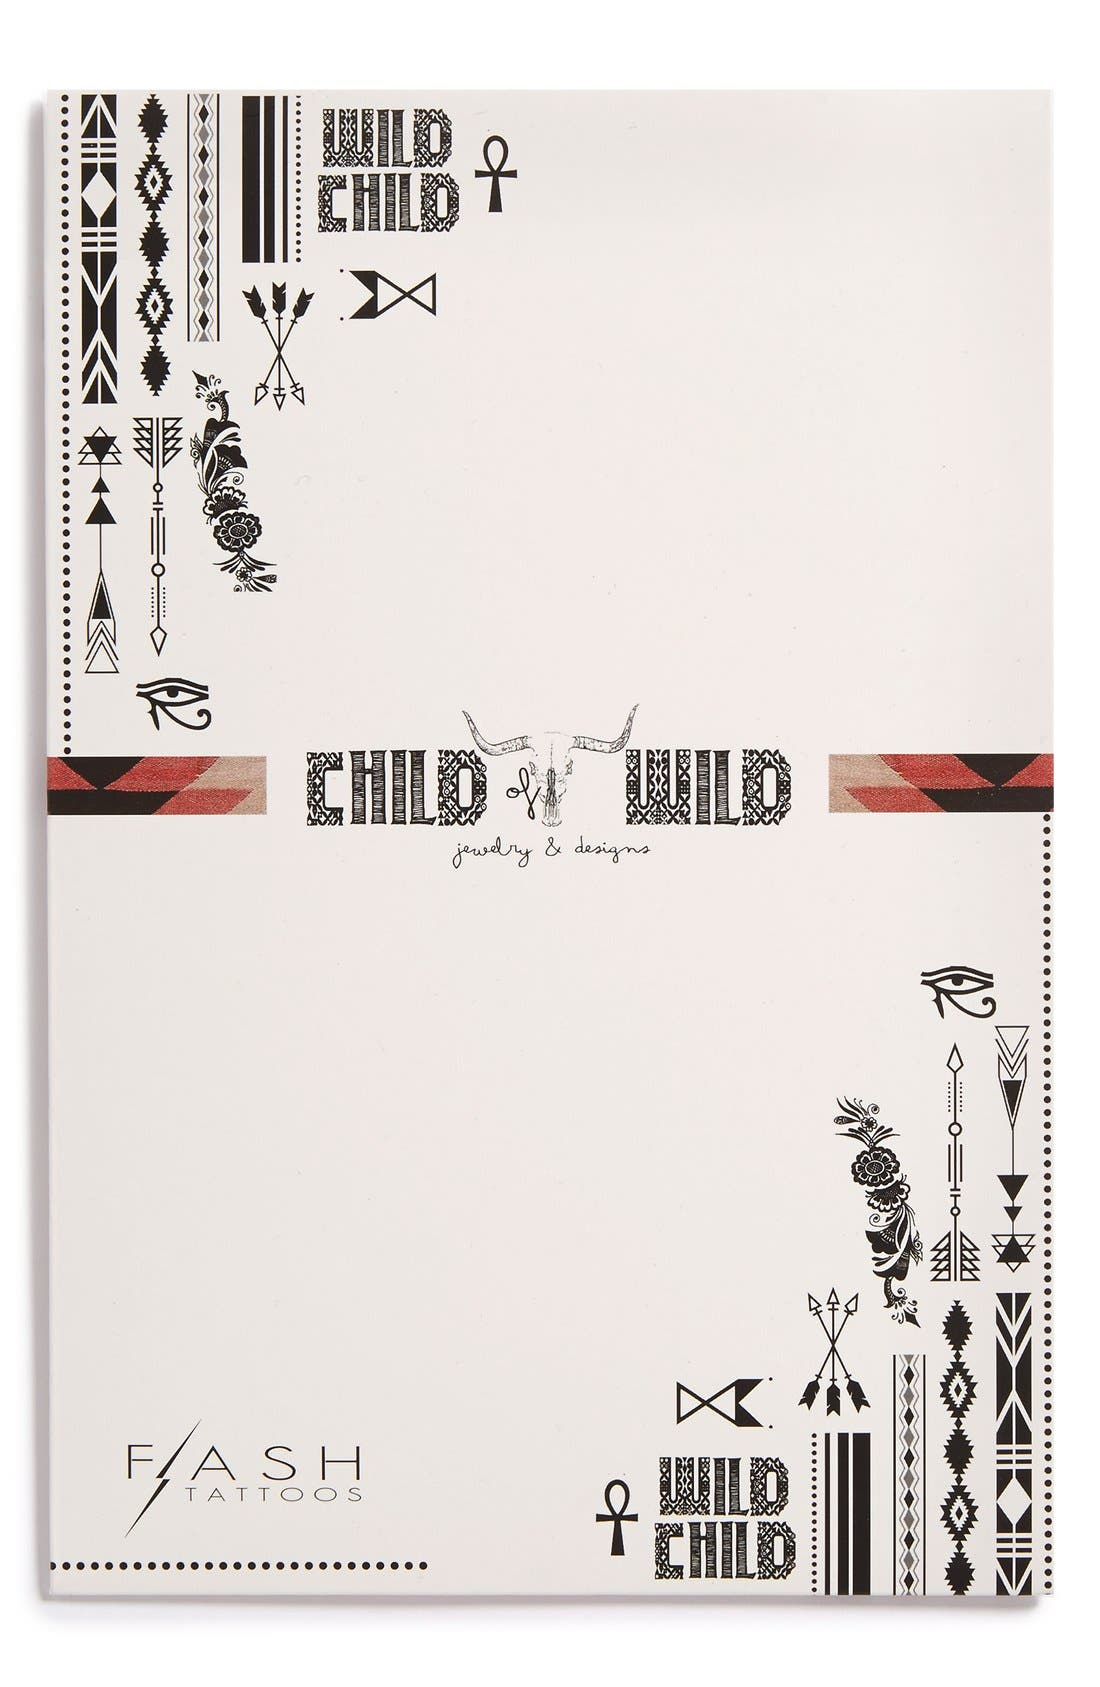 Alternate Image 1 Selected - Flash Tattoos 'Child of Wild' Temporary Tattoos (Juniors)